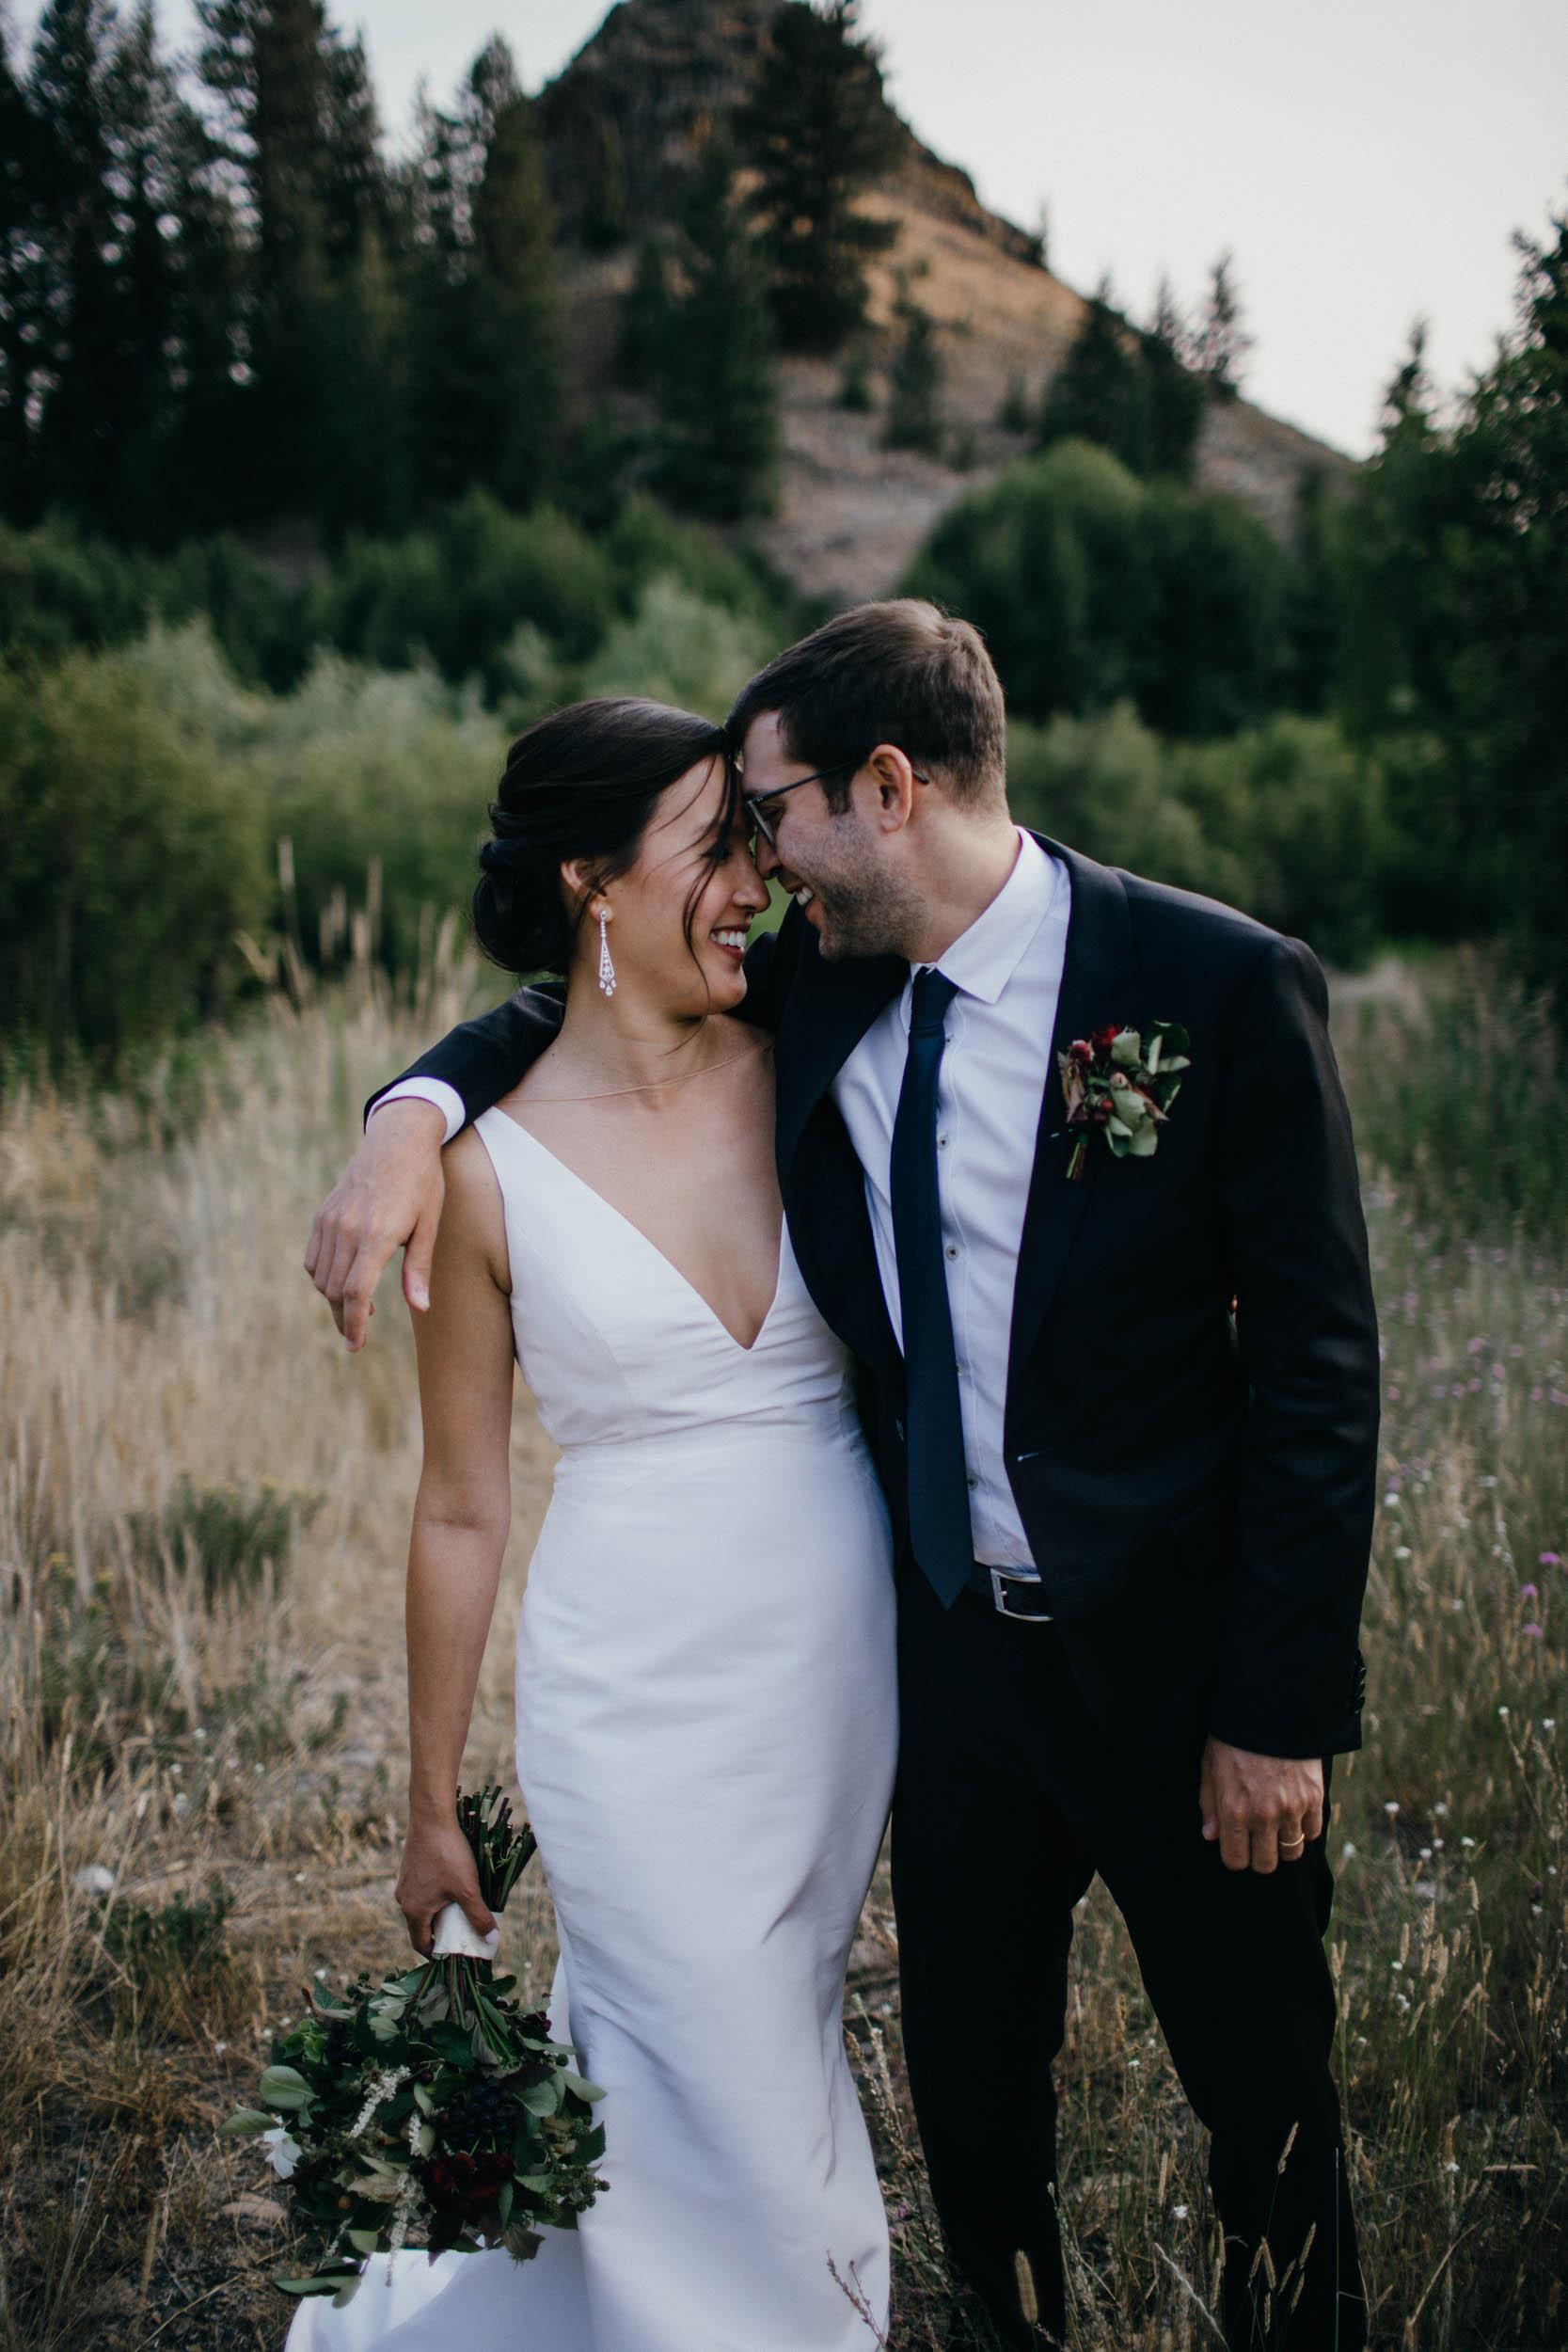 Kat & Sam | Trail Creek Wedding